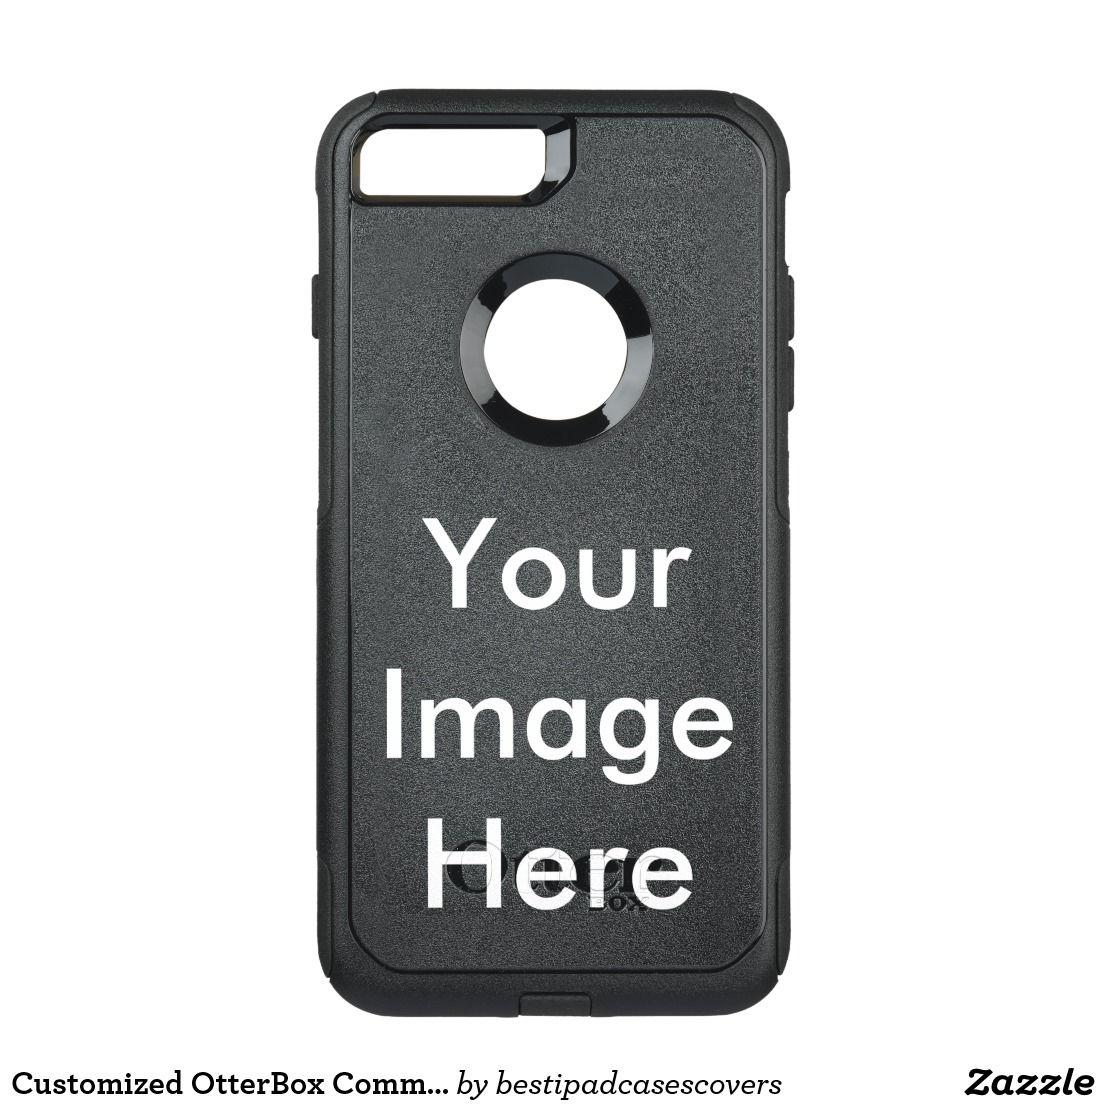 Customized otterbox commuter iphone 7 plus case zazzle